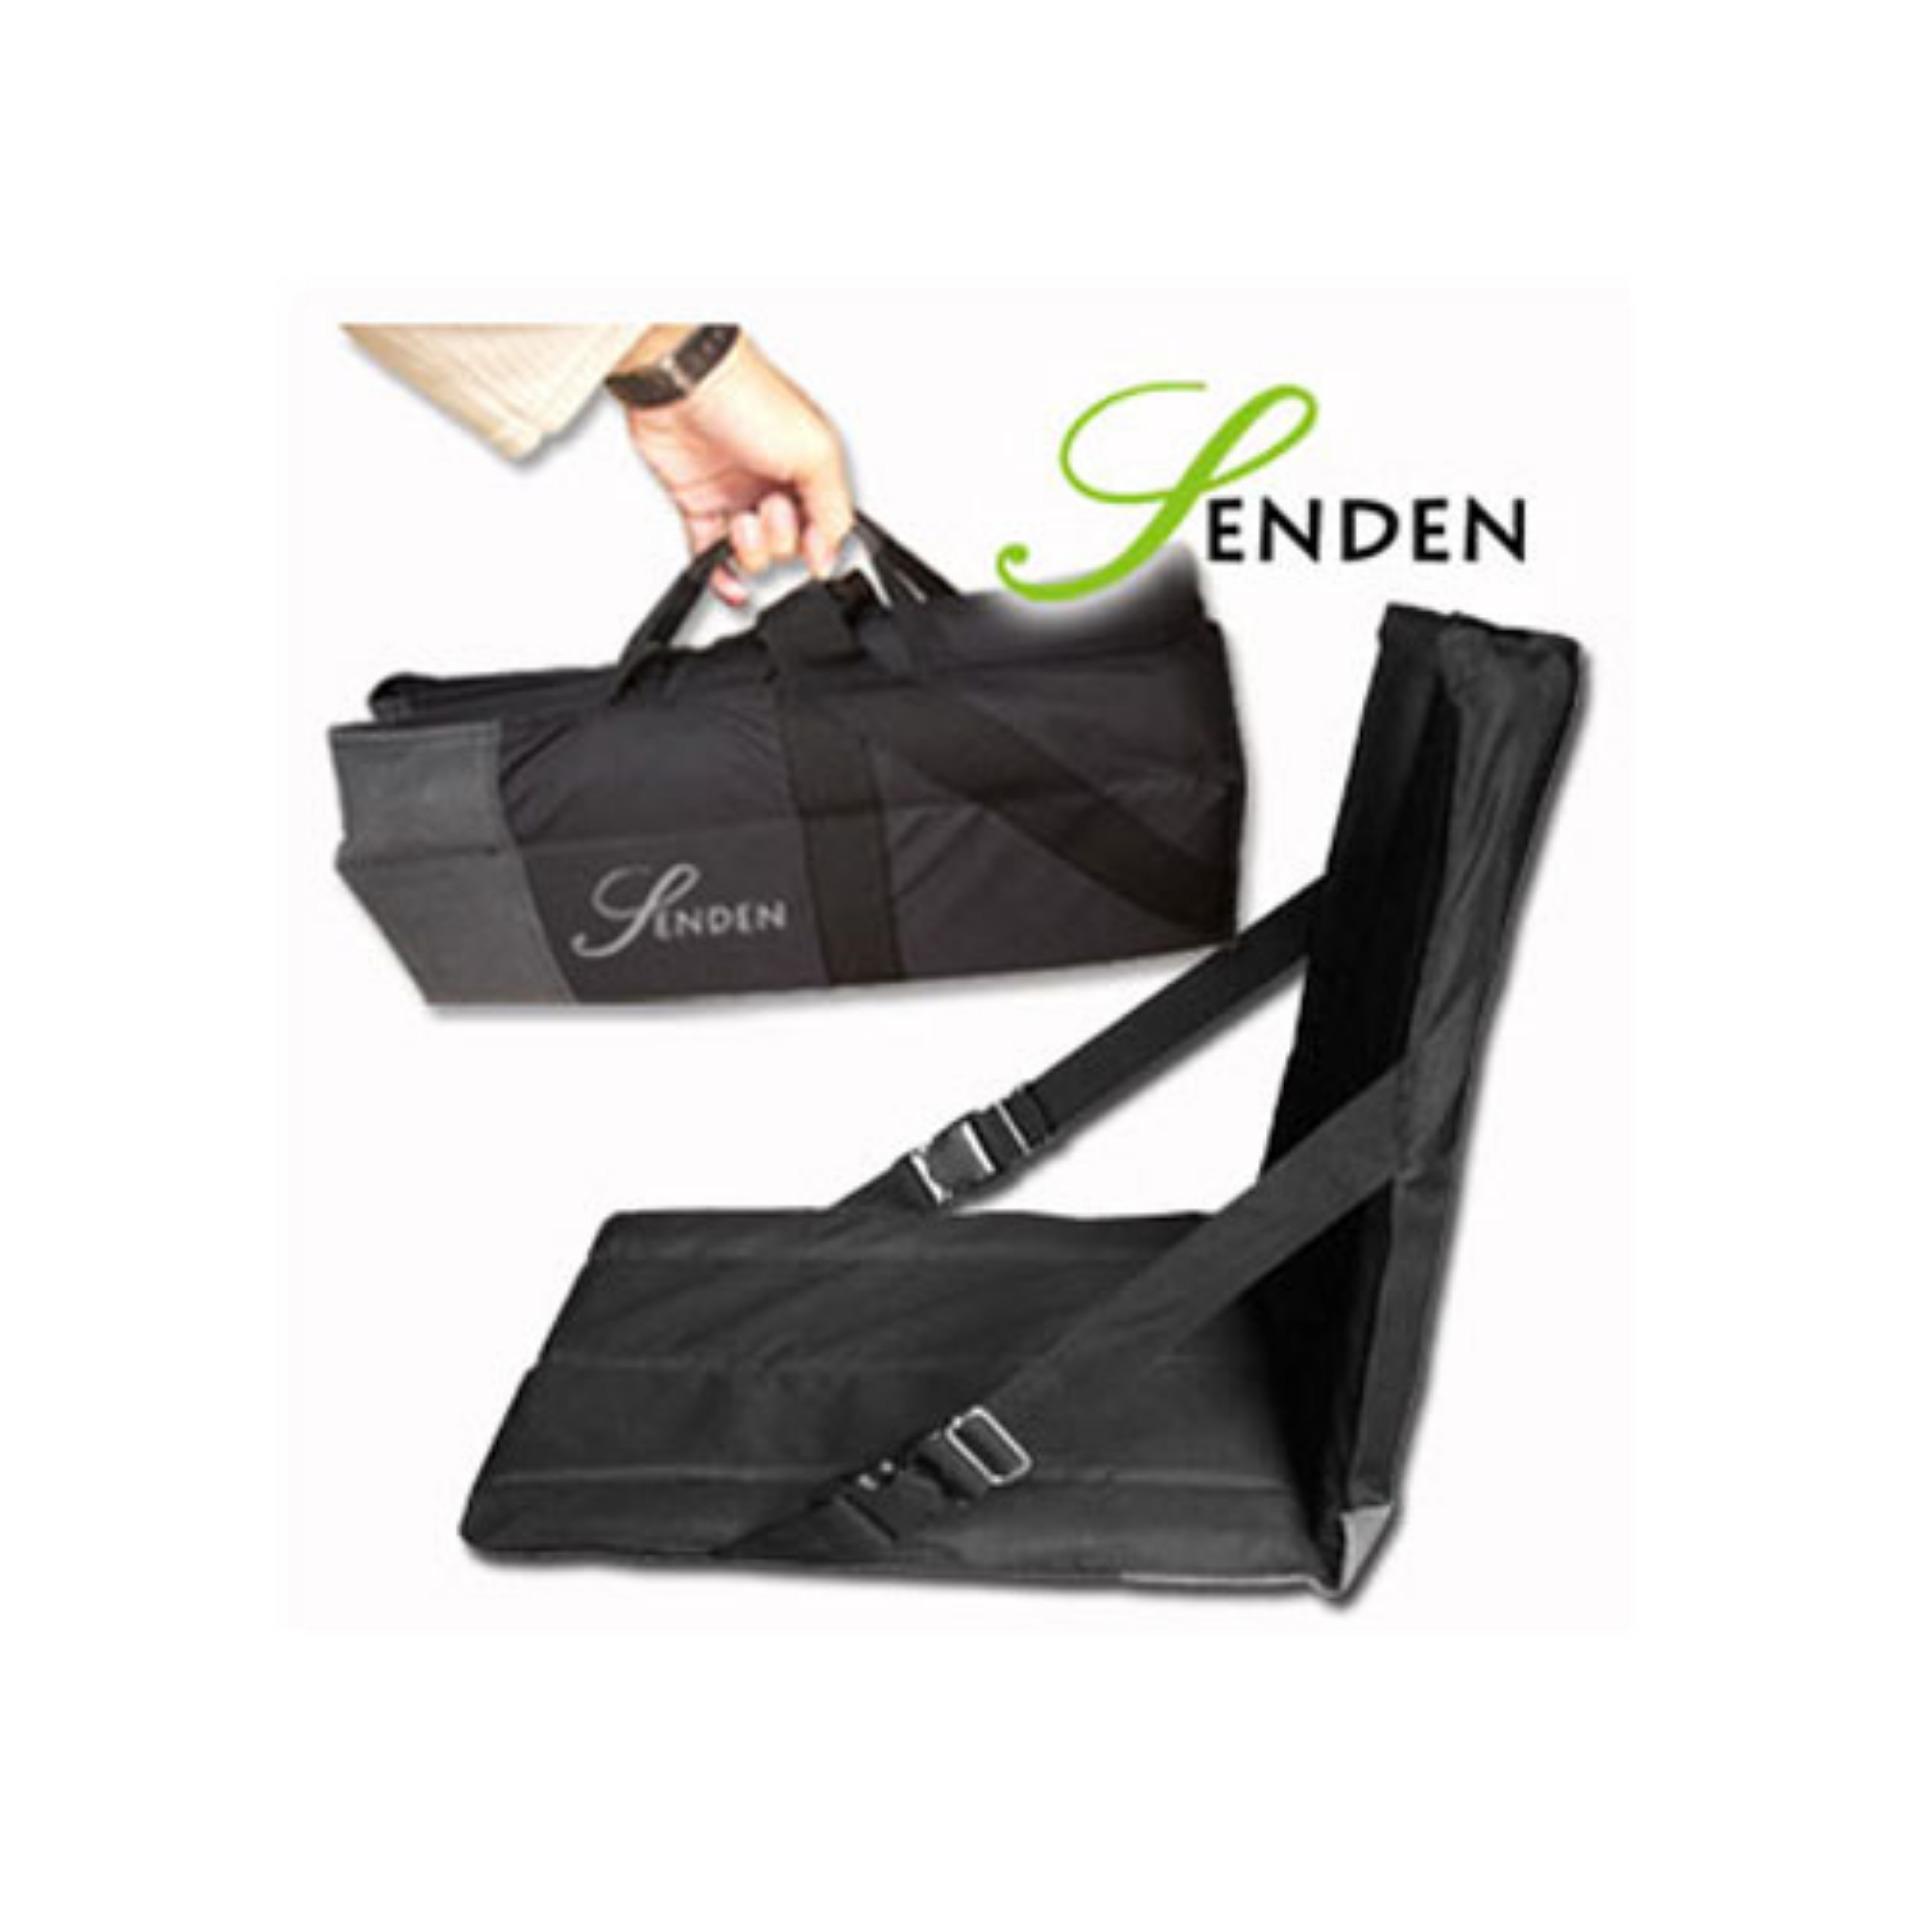 Kursi Lesehan Lipat / Kursi Sandaran Lipat Portable Motif Polos - Hitam SENDEN